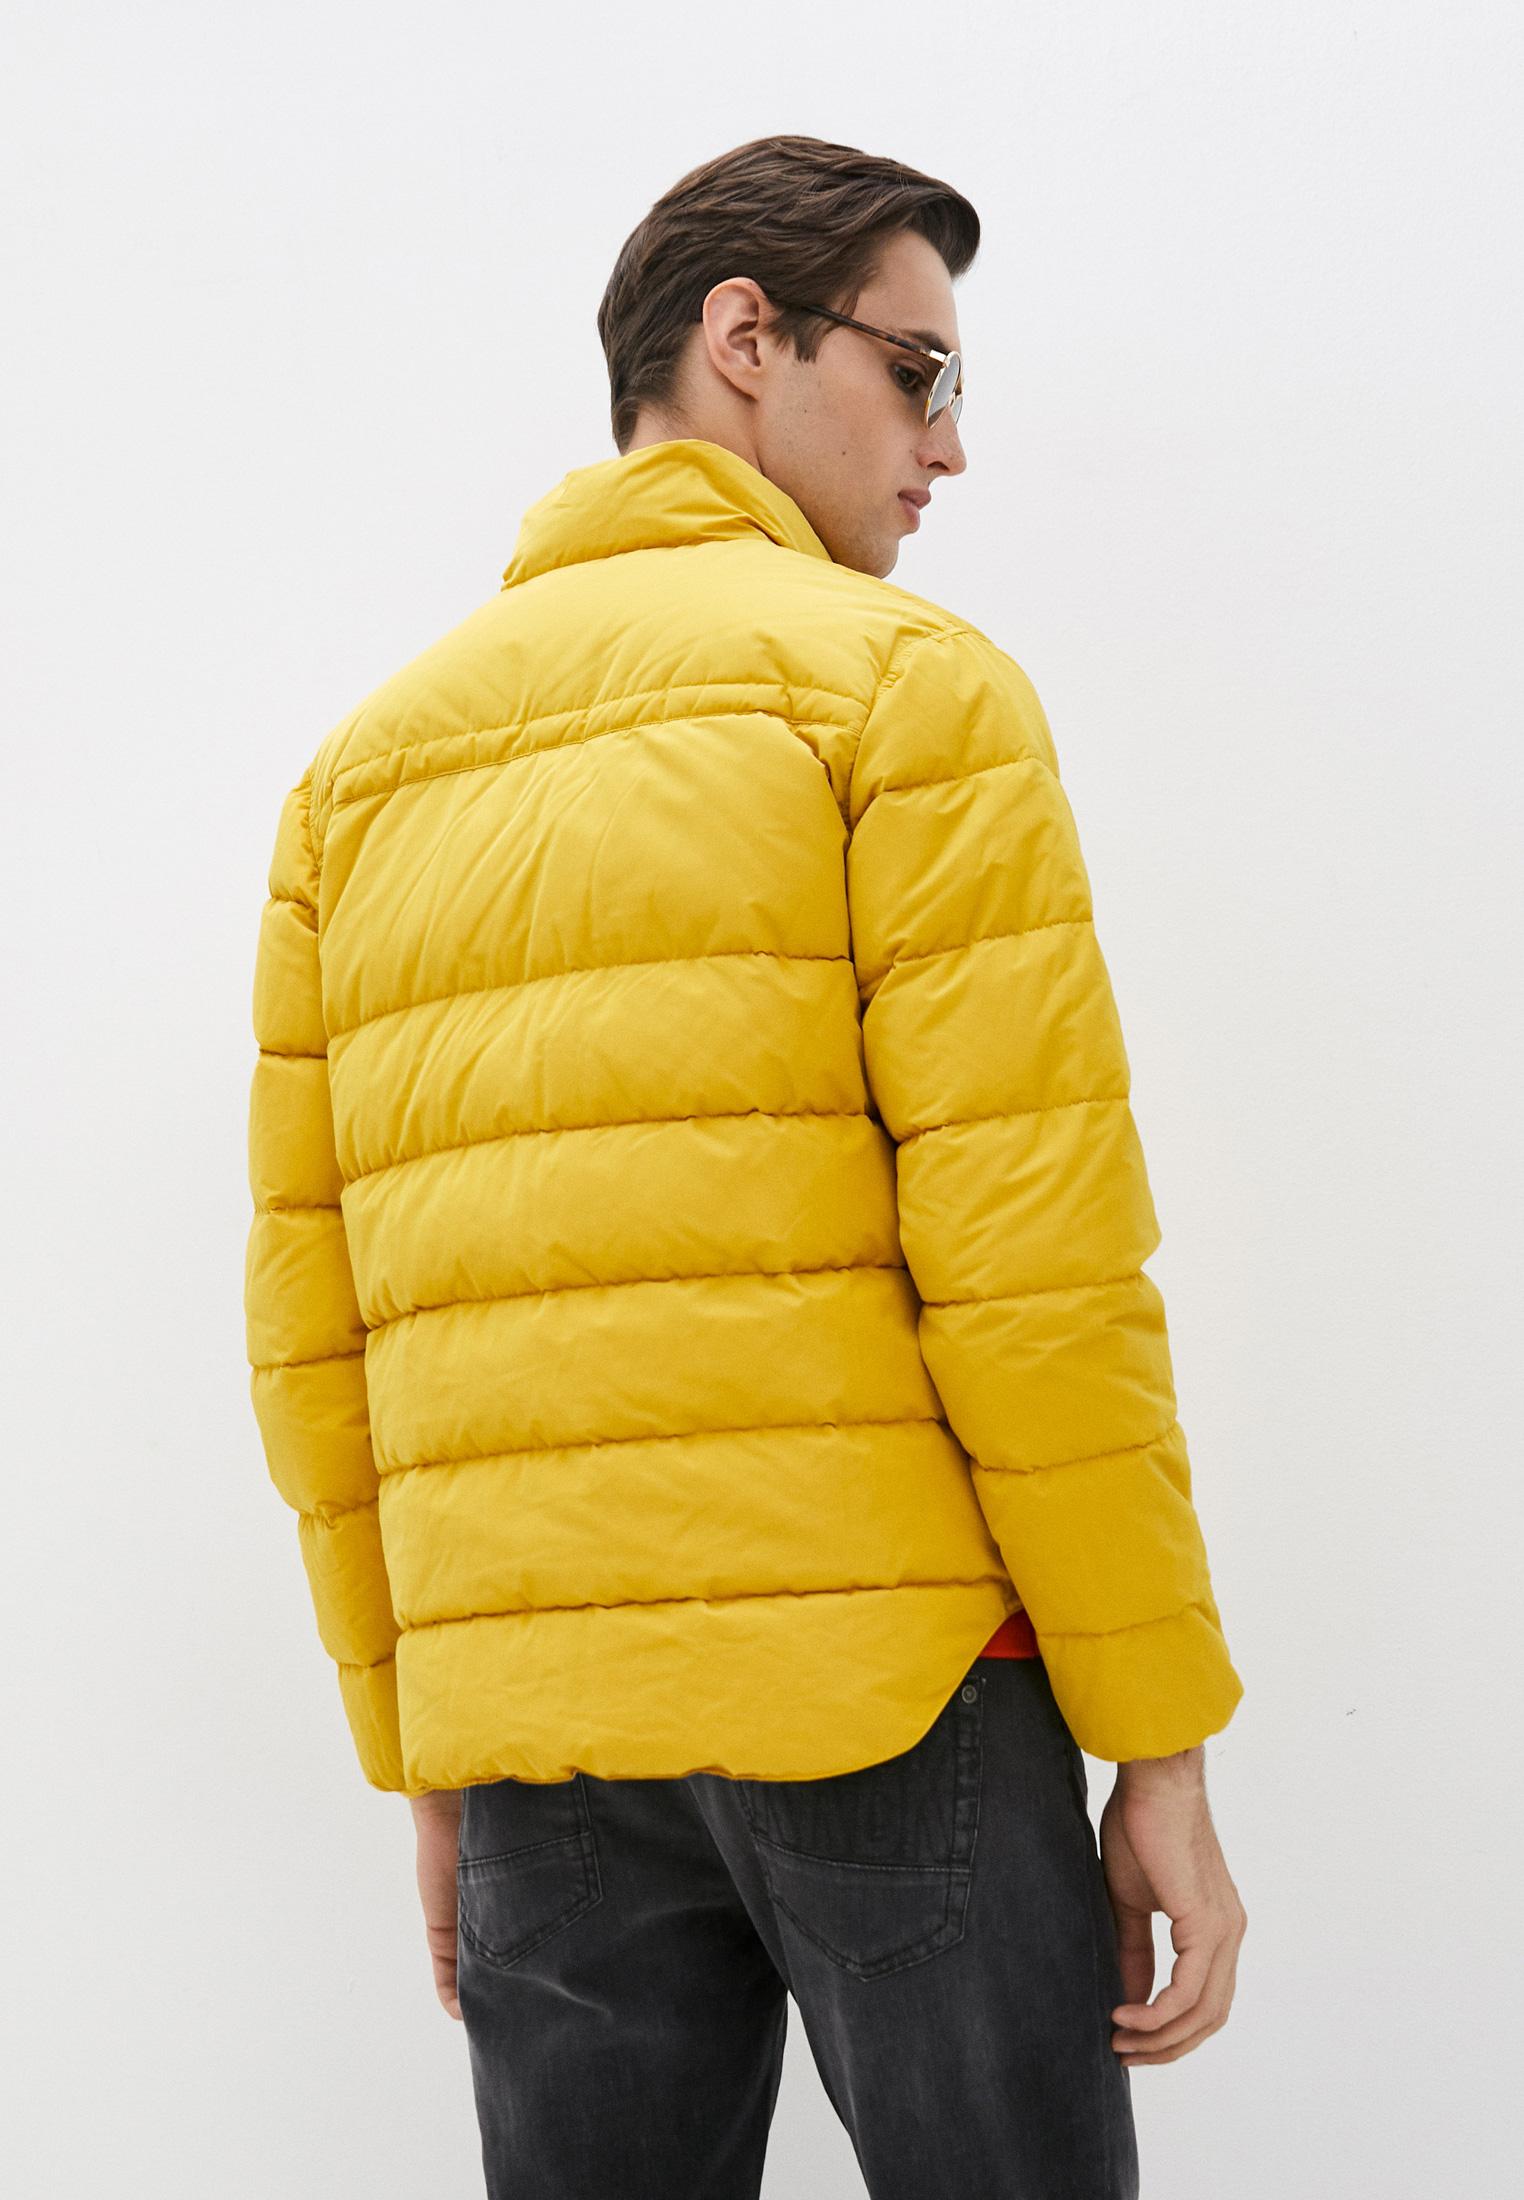 Мужская куртка Bikkembergs (Биккембергс) C H 087 00 T 9839: изображение 4